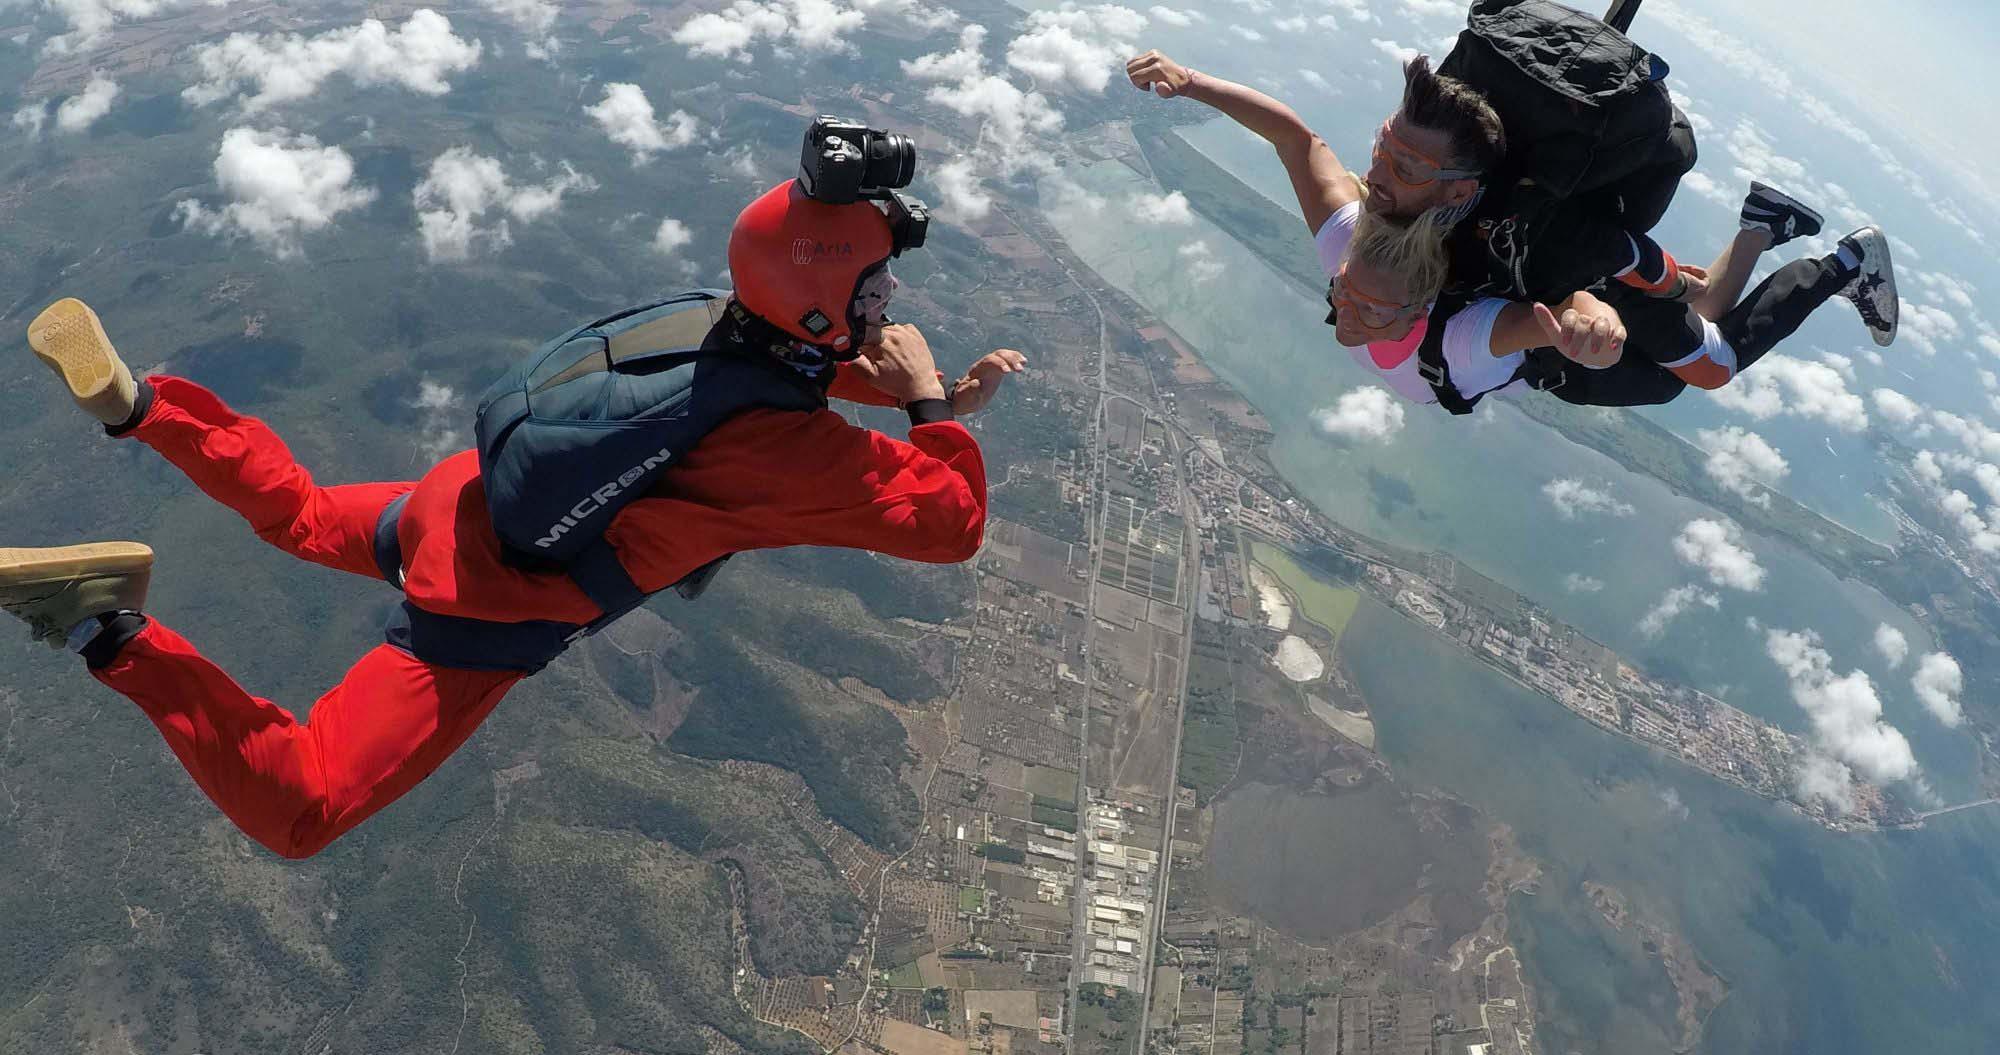 maremma avventura paracadutismo